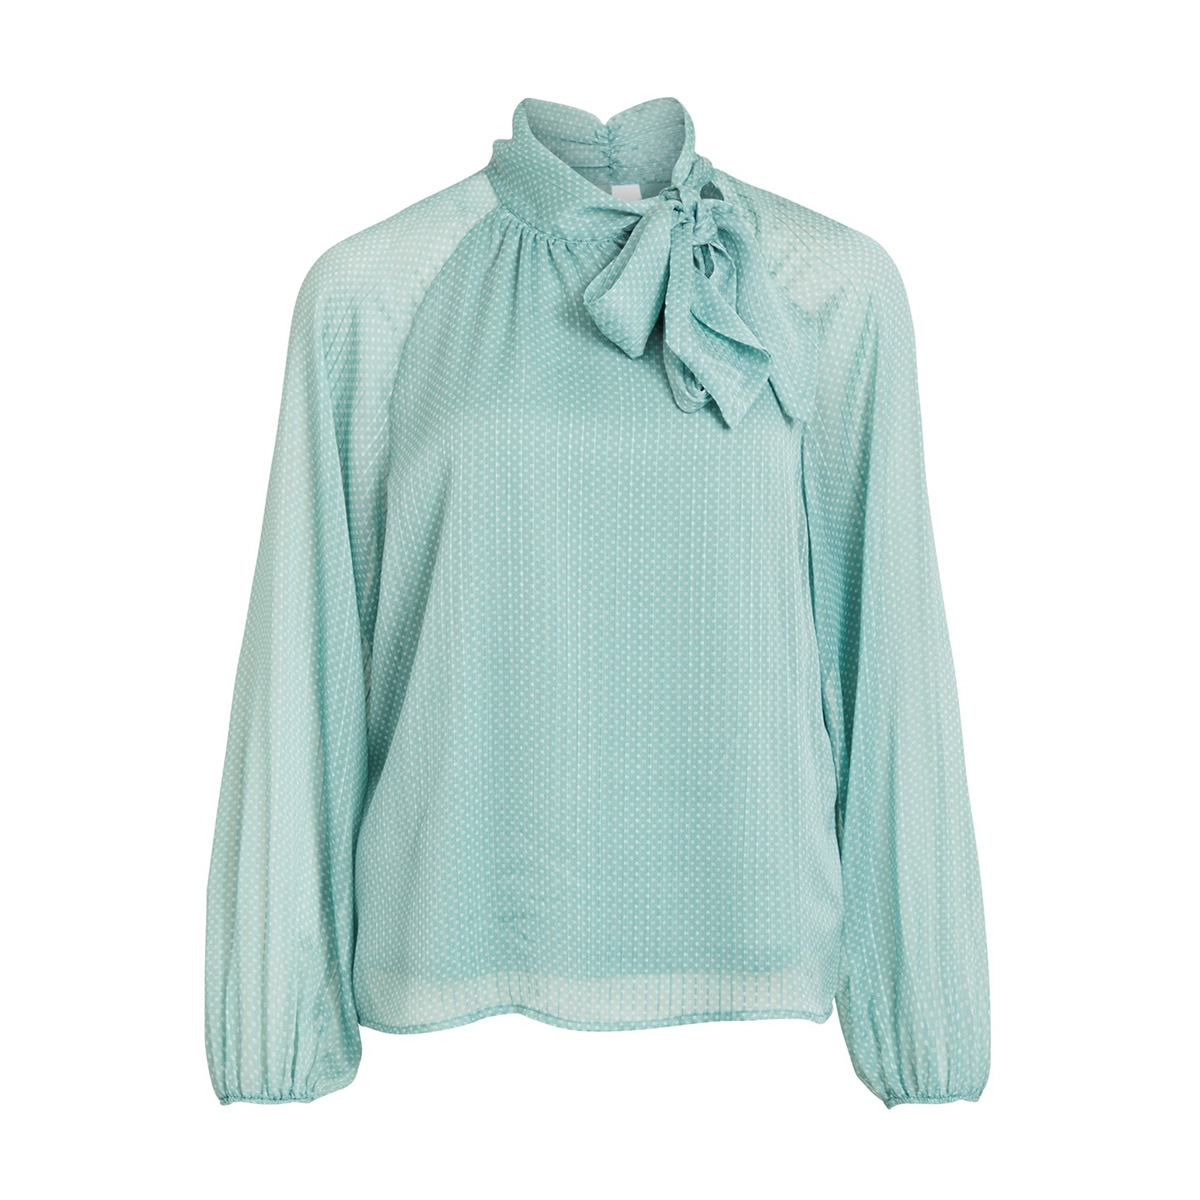 vipallea l/s top/des 14053990 vila blouse oil blue/w. whisper